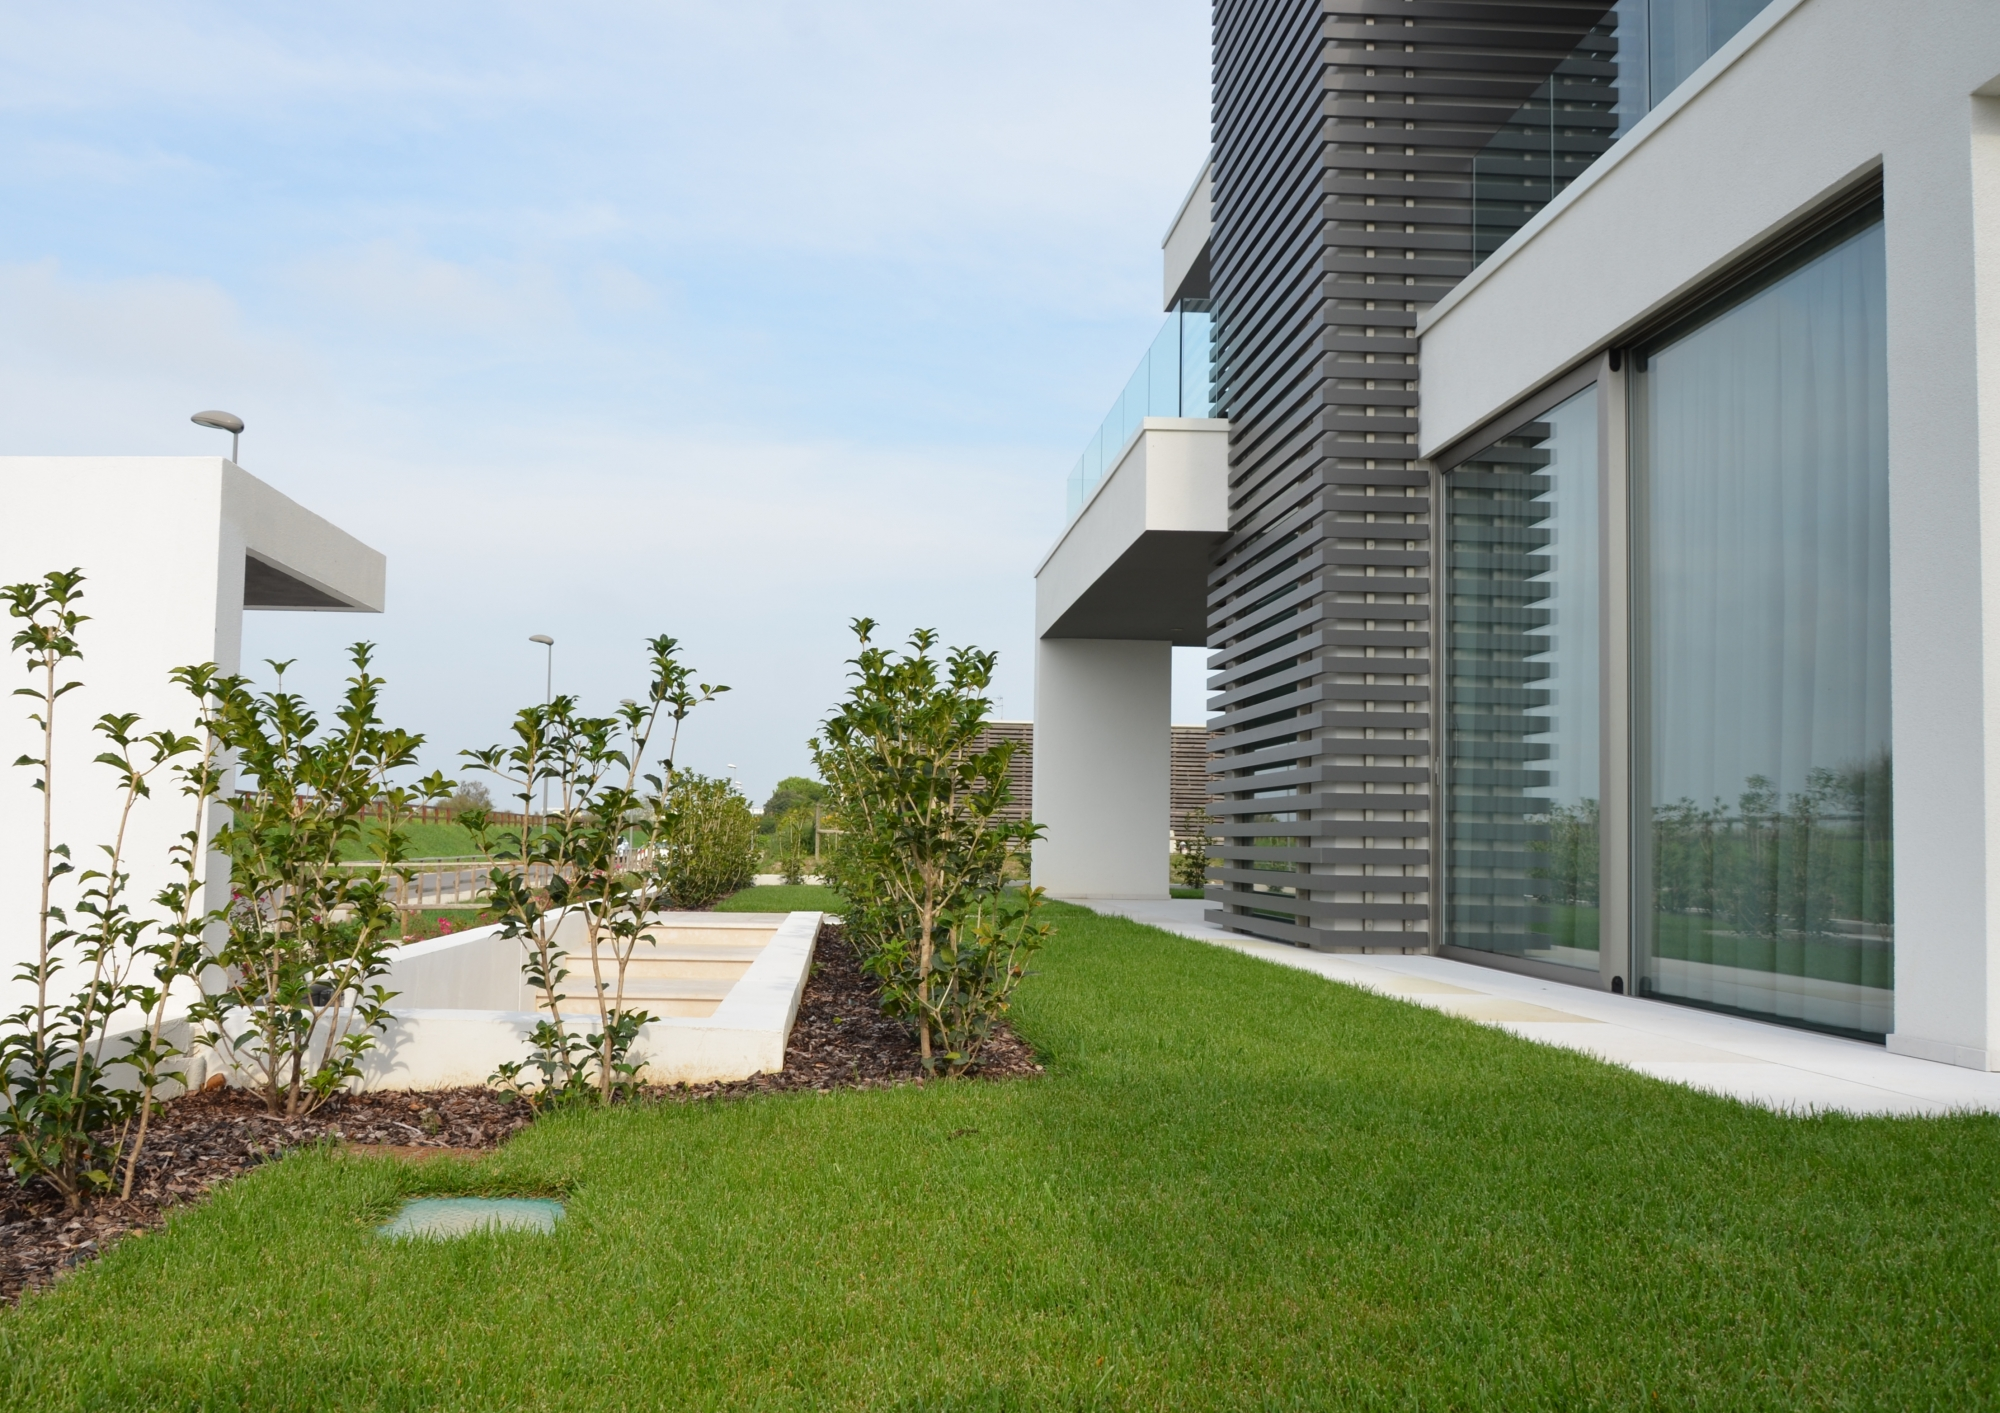 terrazze coperte - 28 images - terrazze coperte e g c s r l ...